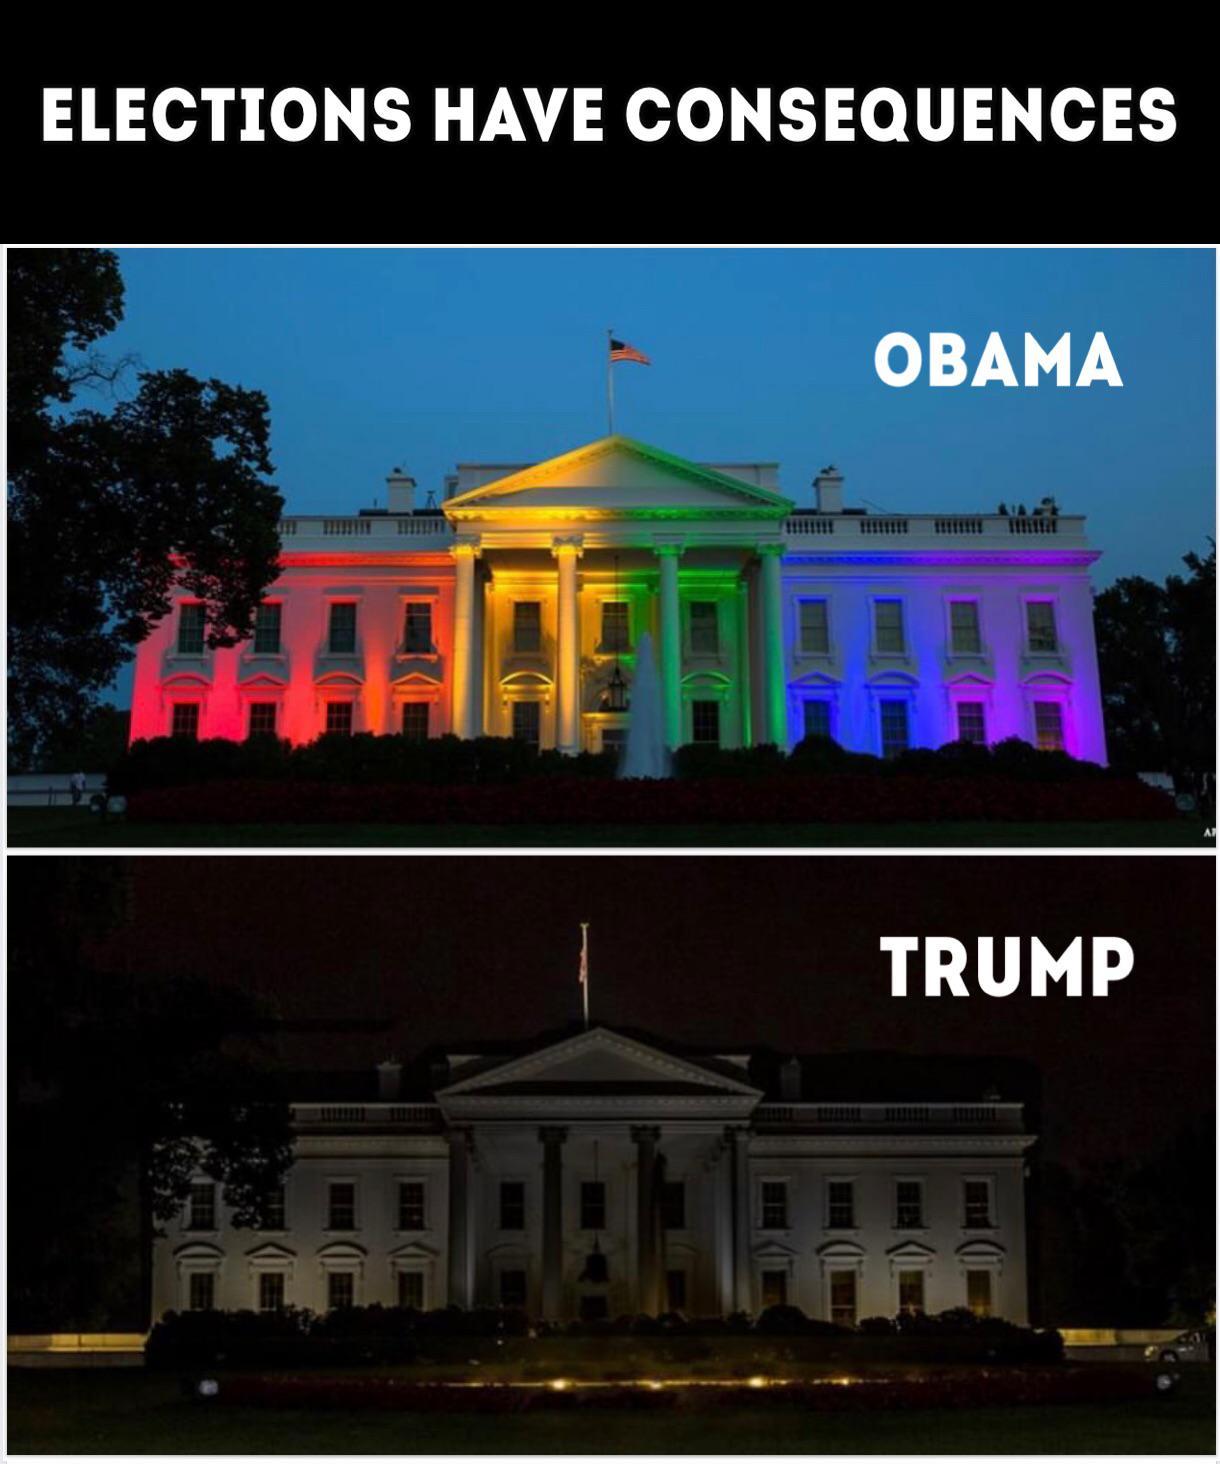 Political, Obama, White House, President, Biden, America Political Memes Political, Obama, White House, President, Biden, America text: ELECTIONS HAVE CONSEQUENCES OBAMA TRUMP